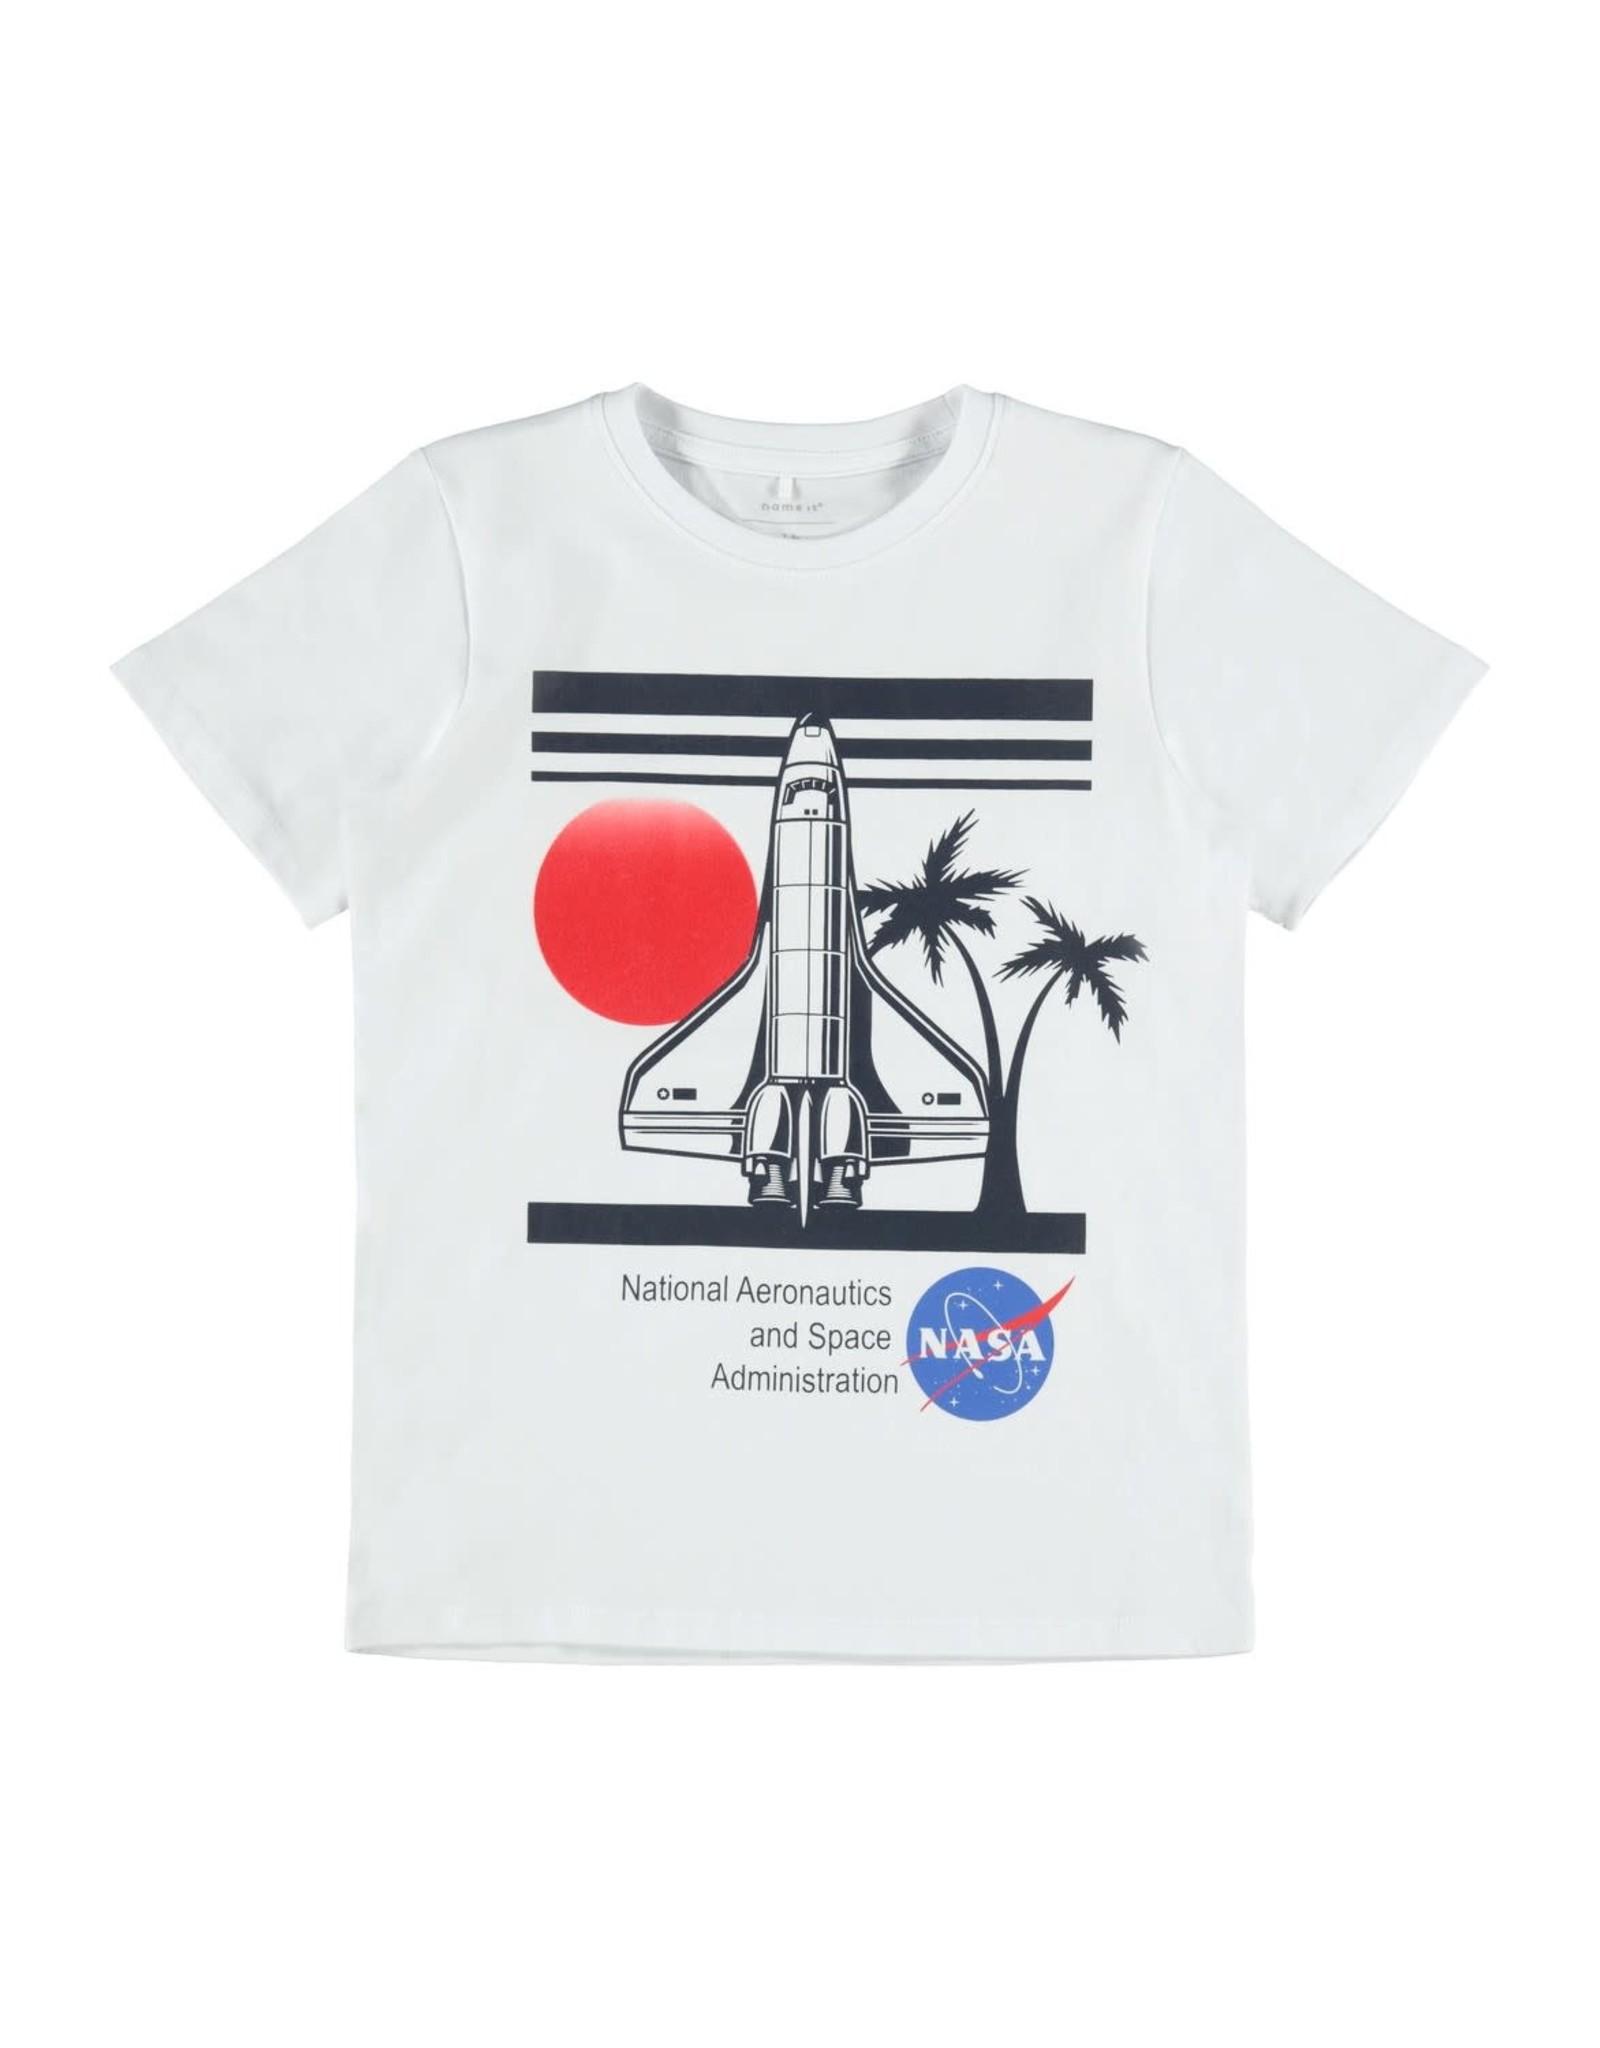 Name It Witte stoere NASA t-shirt van Name It